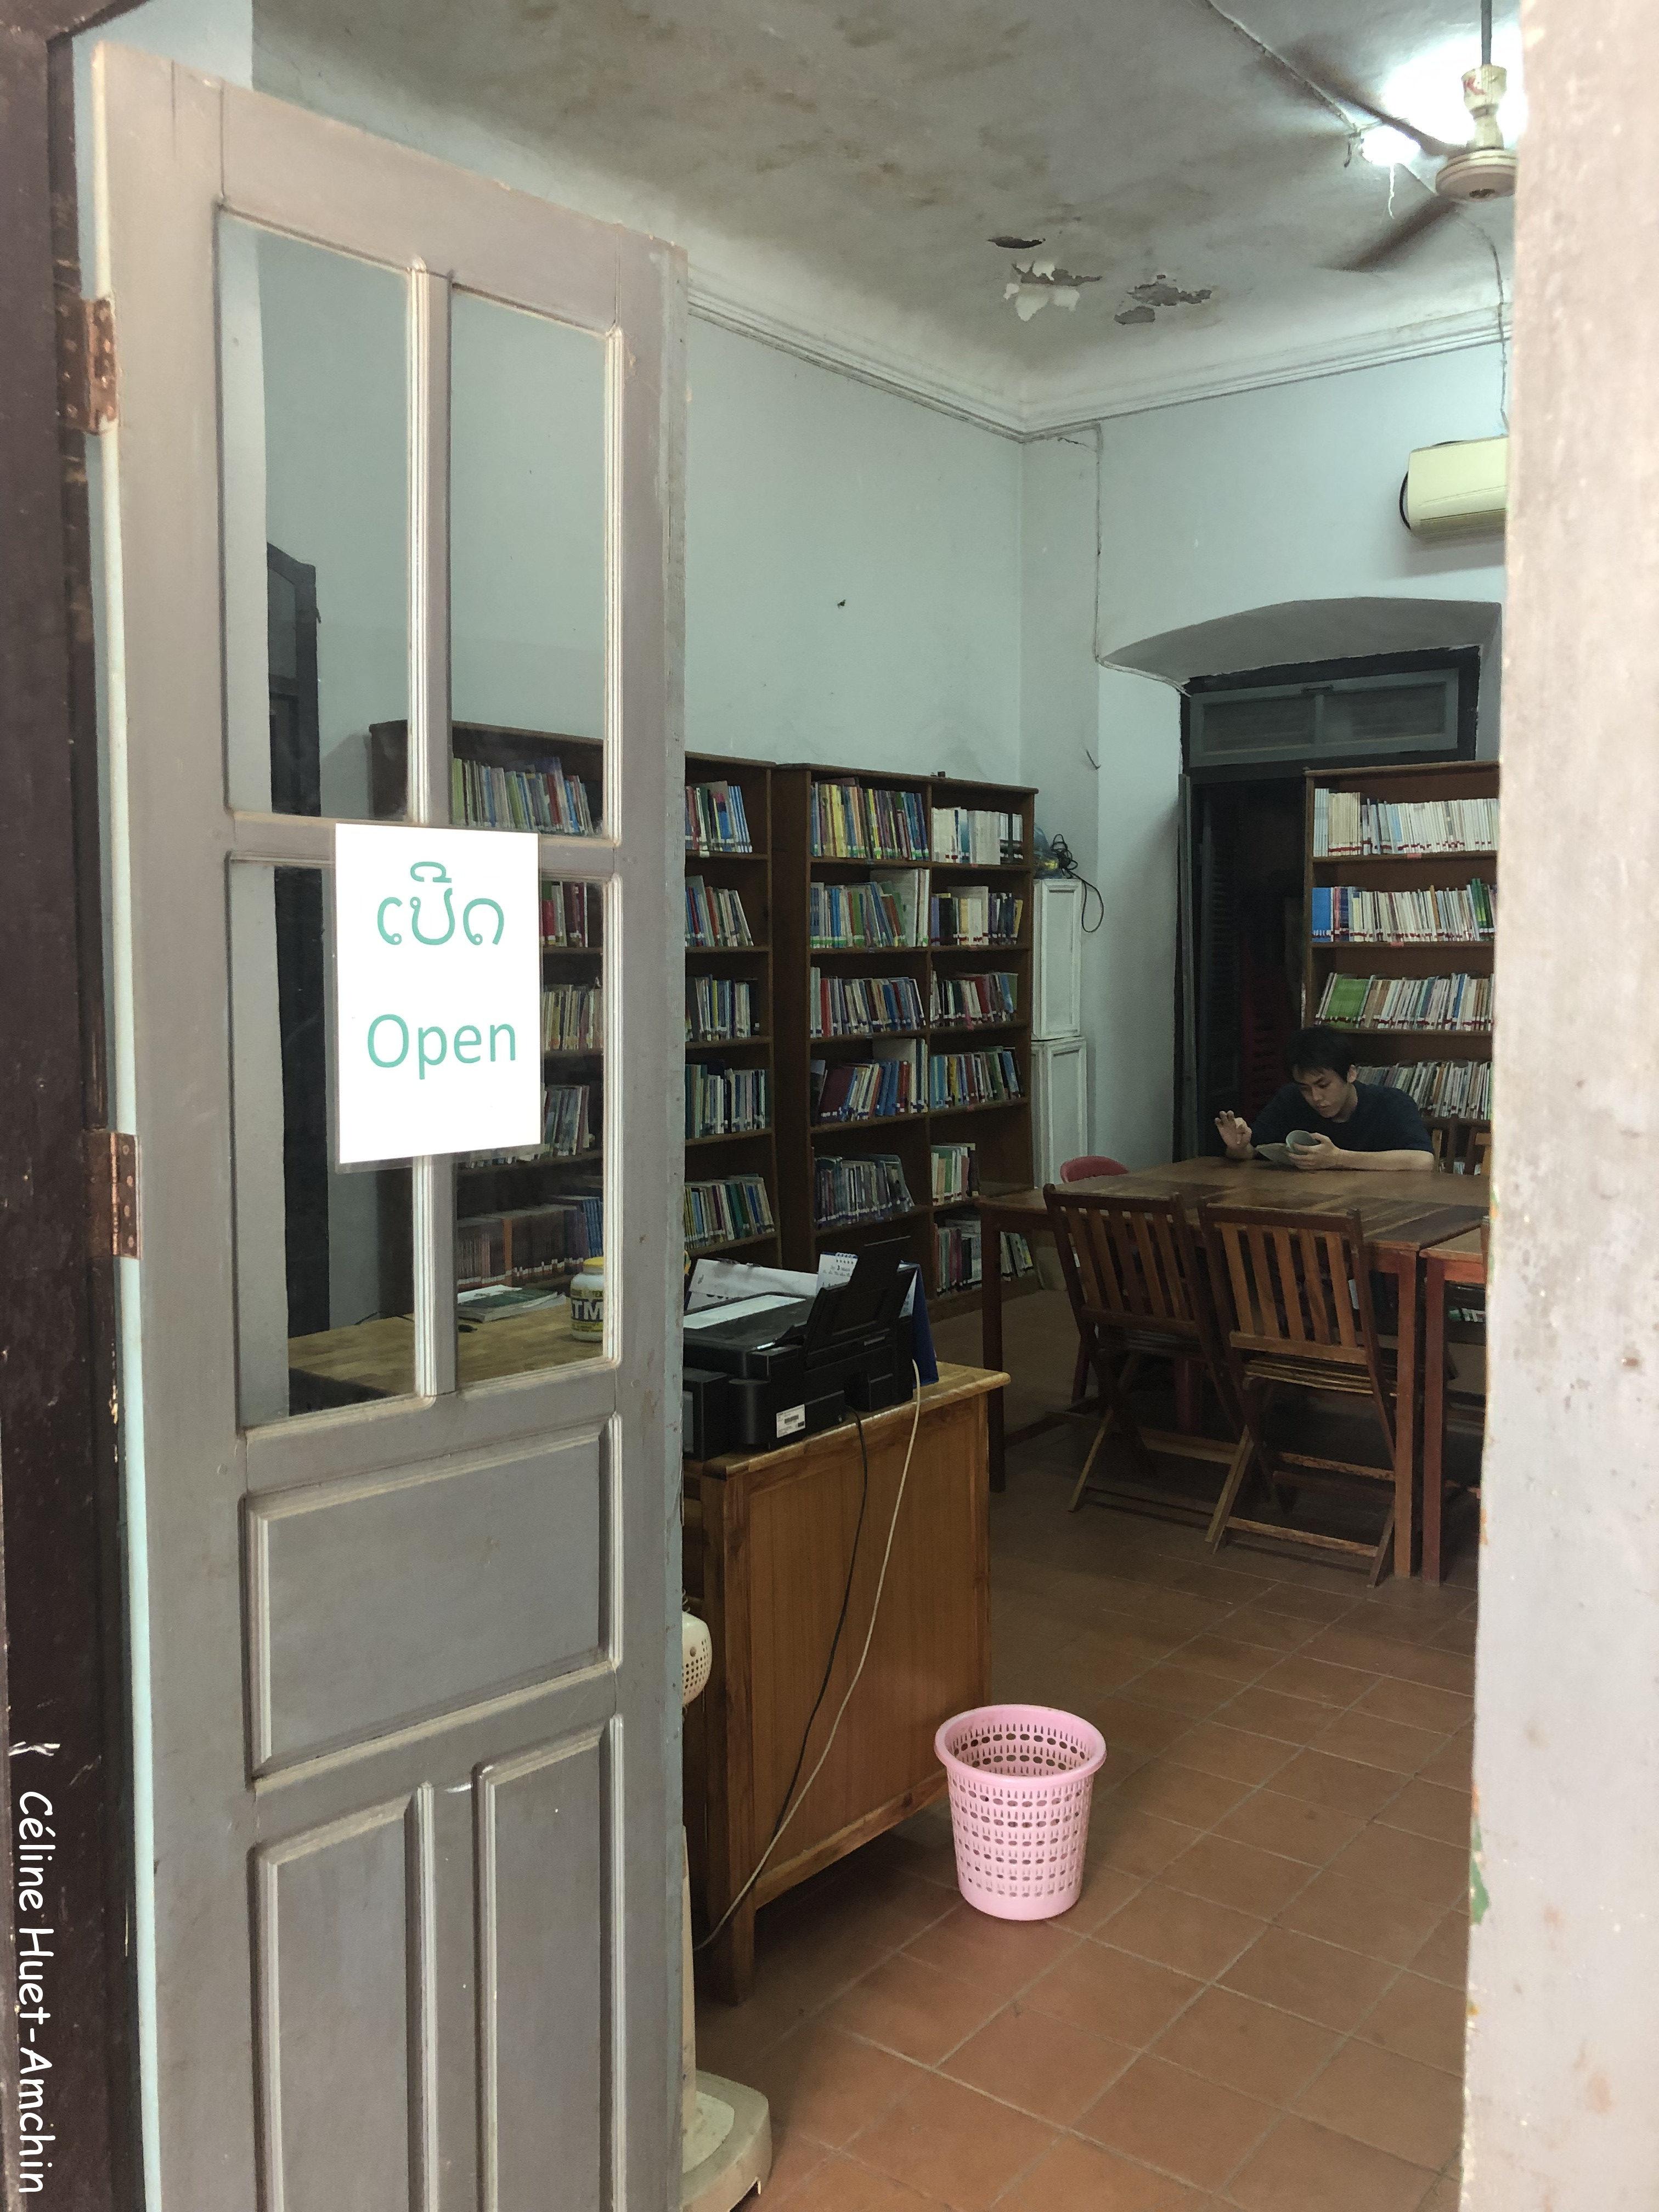 Bibliothèque Luang Prabang Laos Asie